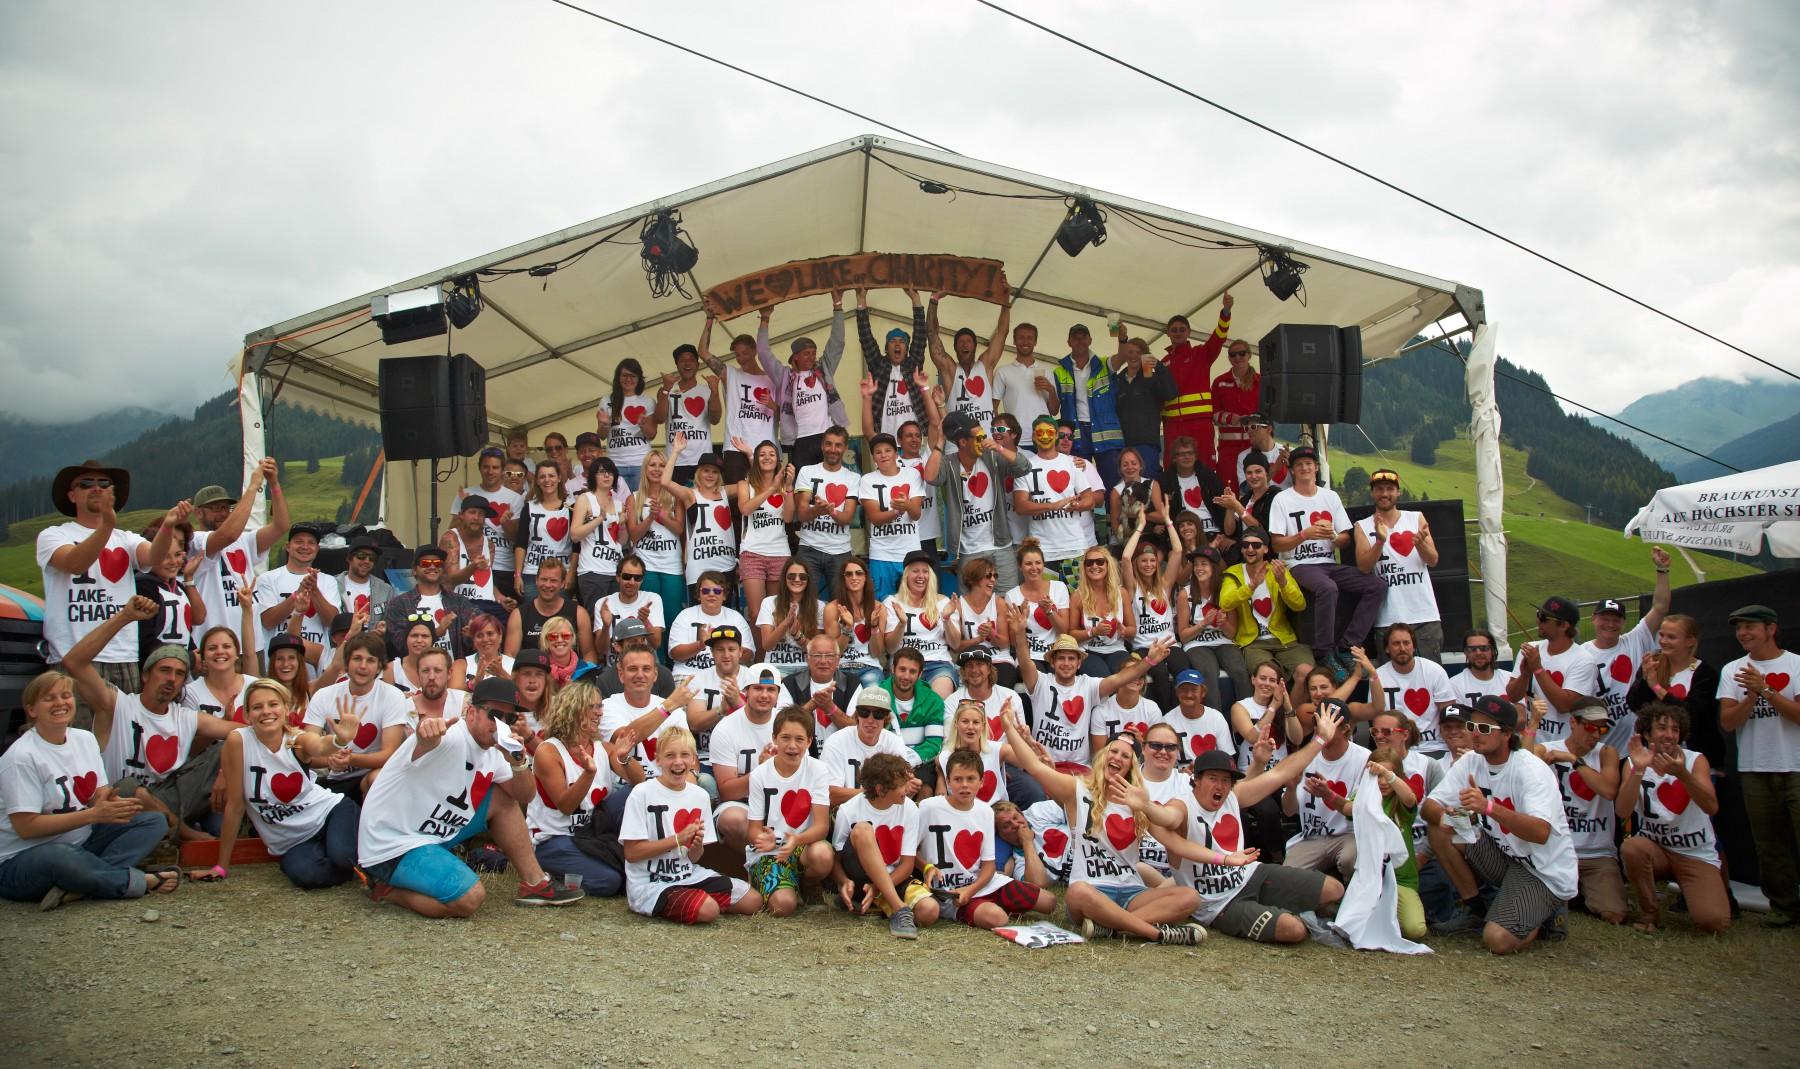 BLACKBIRD Ind. Bochum - Lake of Charity 18 Crew